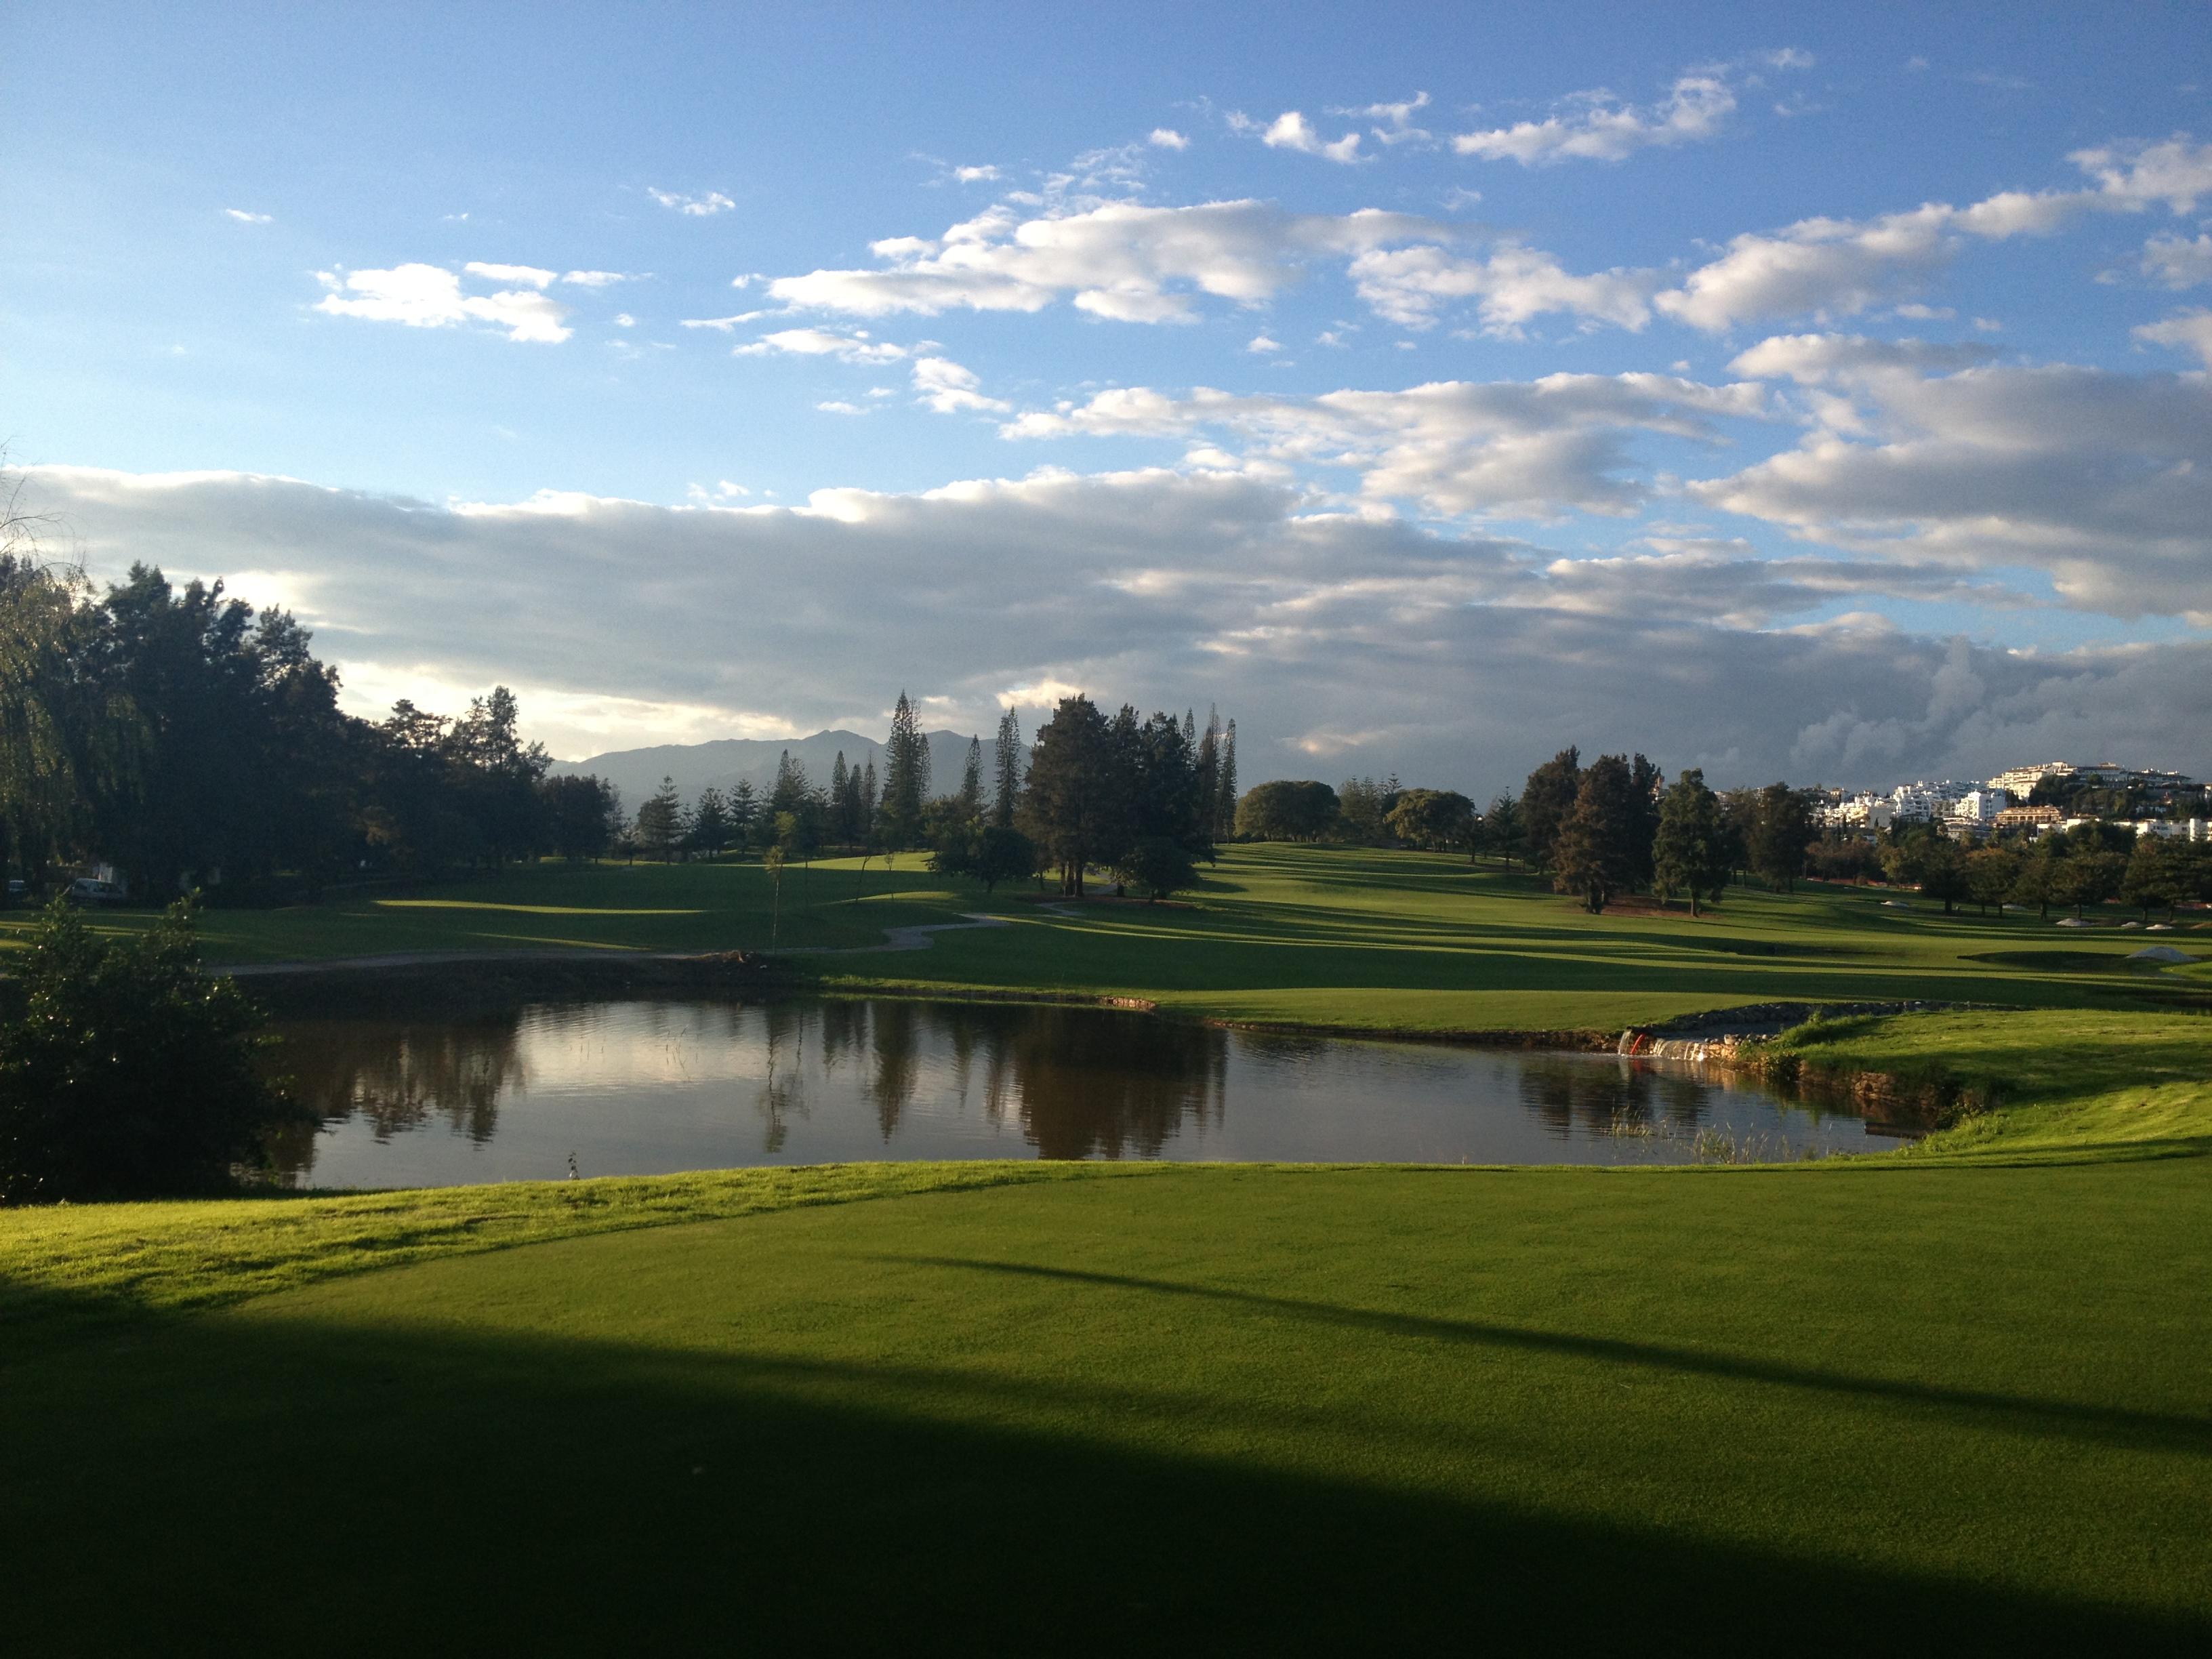 Overview of golf course named Mijas Golf Internacional